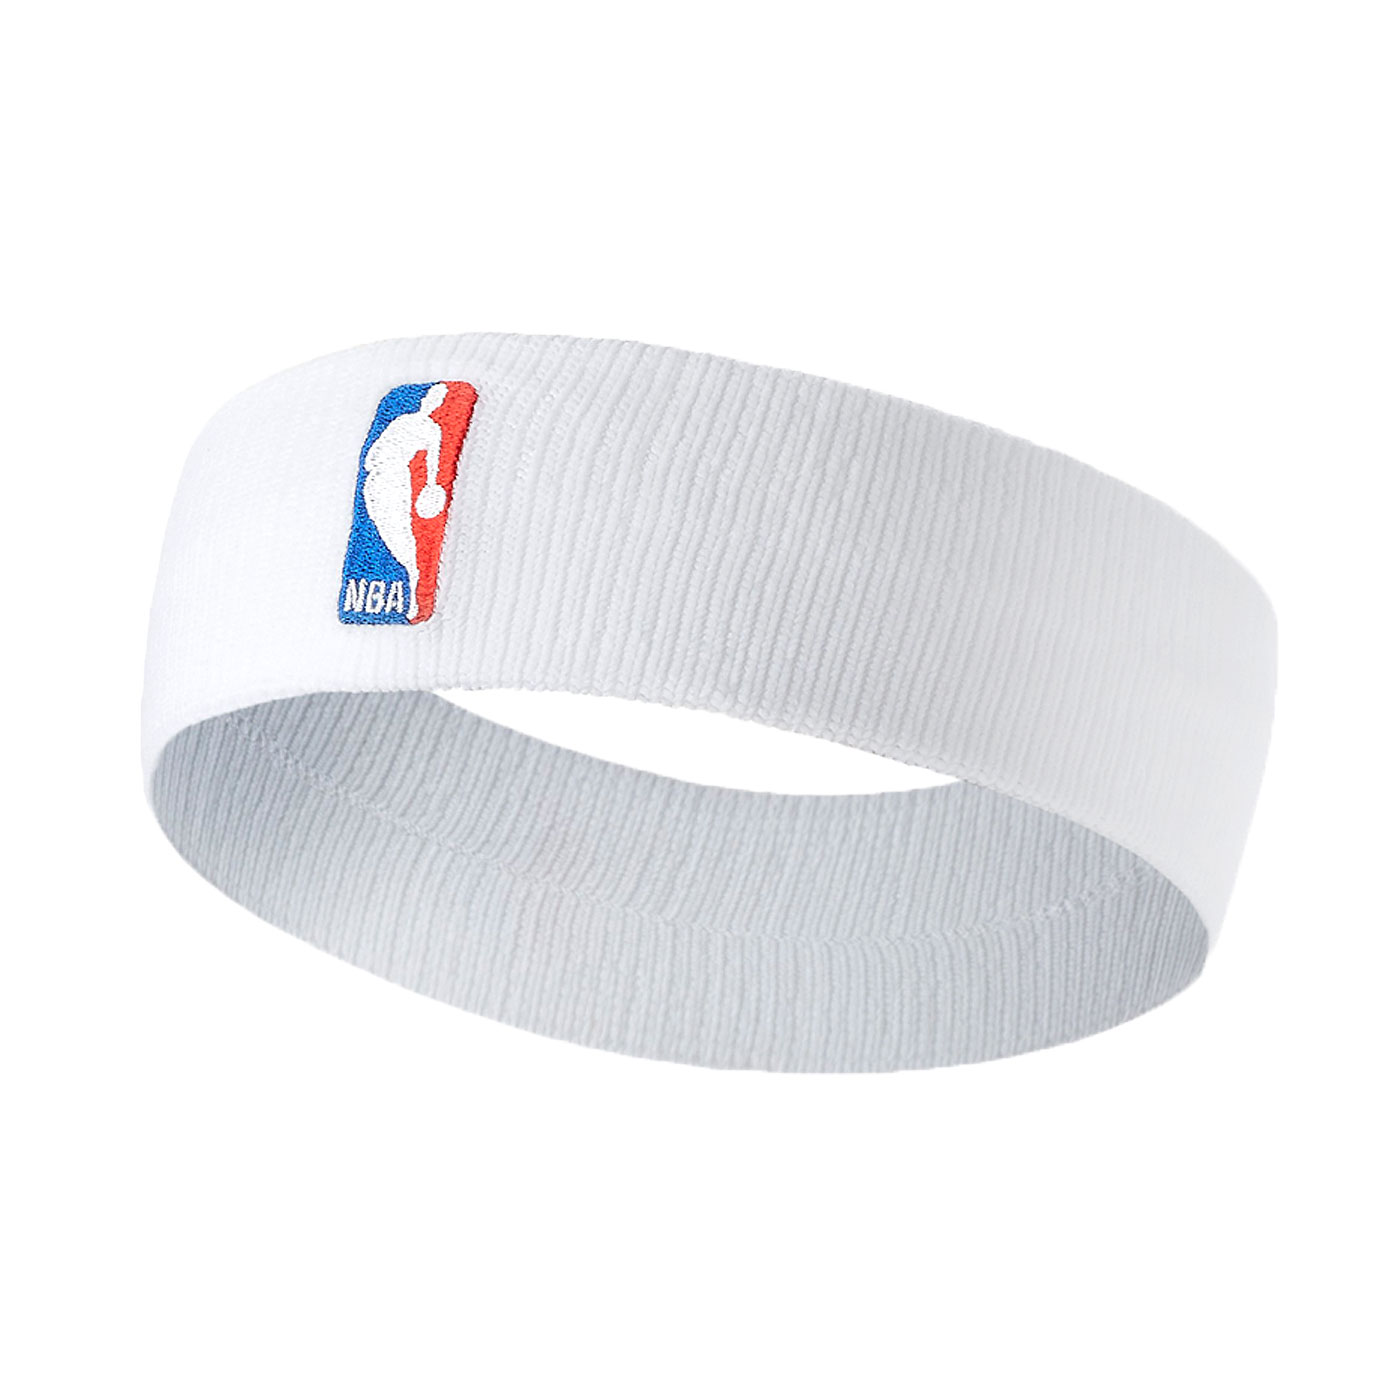 NIKE NBA DRI-FIT 單色頭帶(客場) NKN02100OS - 白紅藍